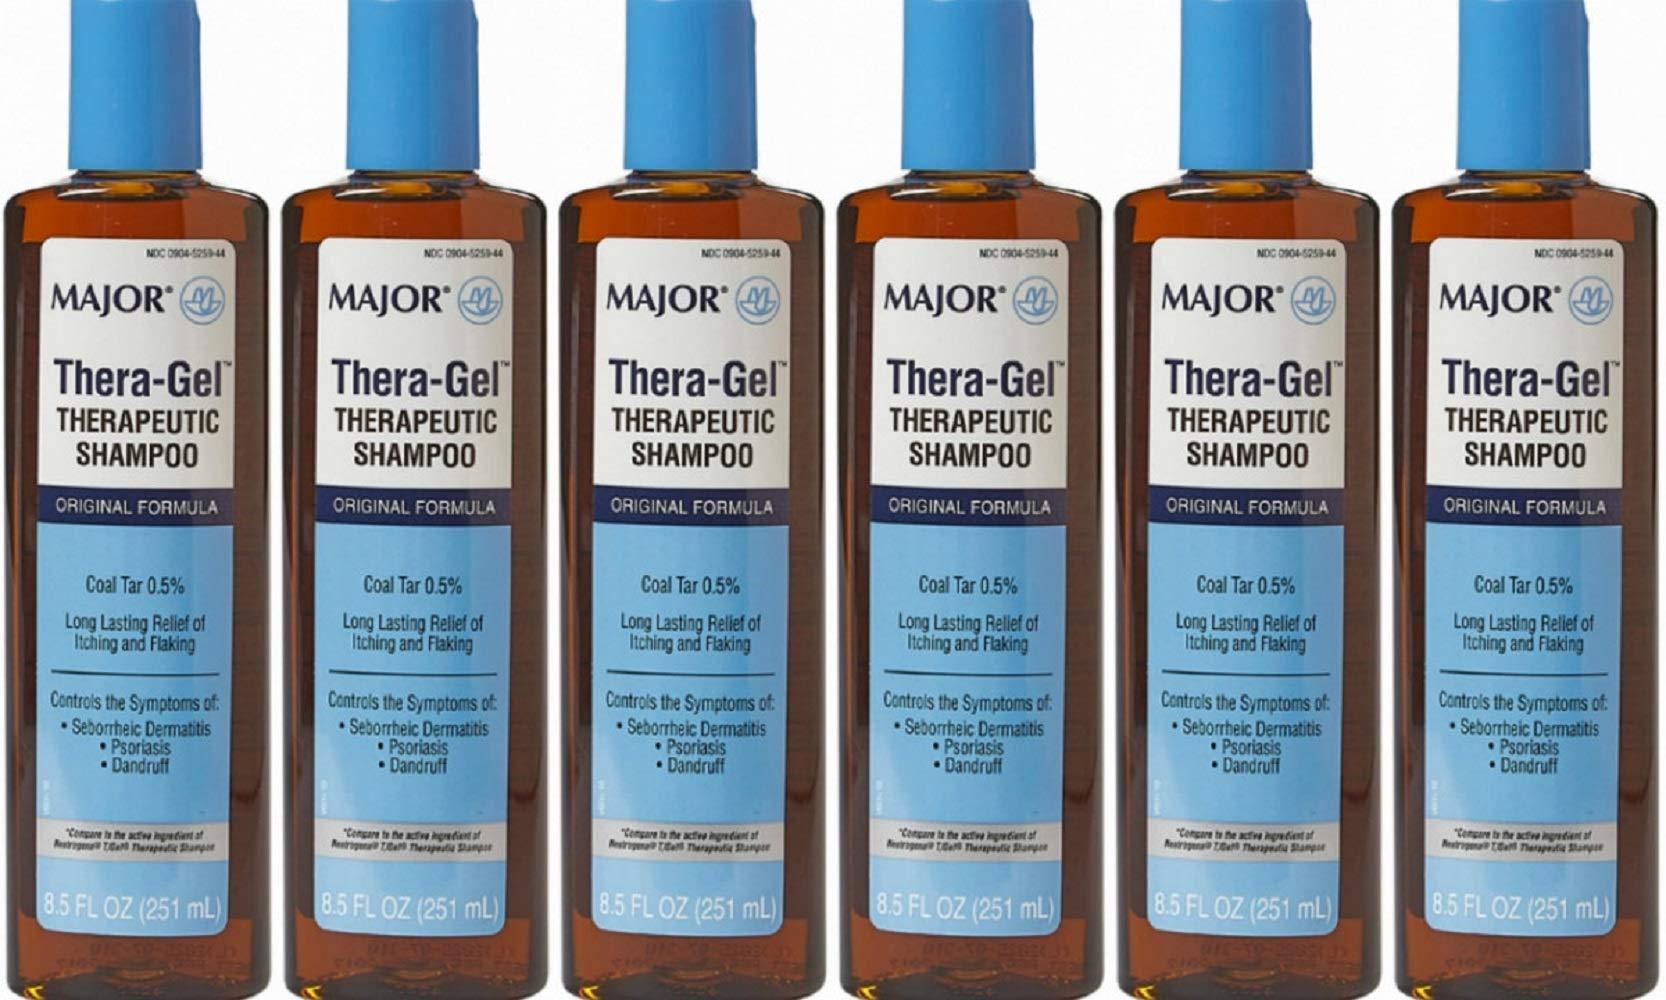 (6 Pack) MAJOR THERA-GEL SHAMPOO COAL TAR-1% Brown 251 ML UPC 309045259443 by Major